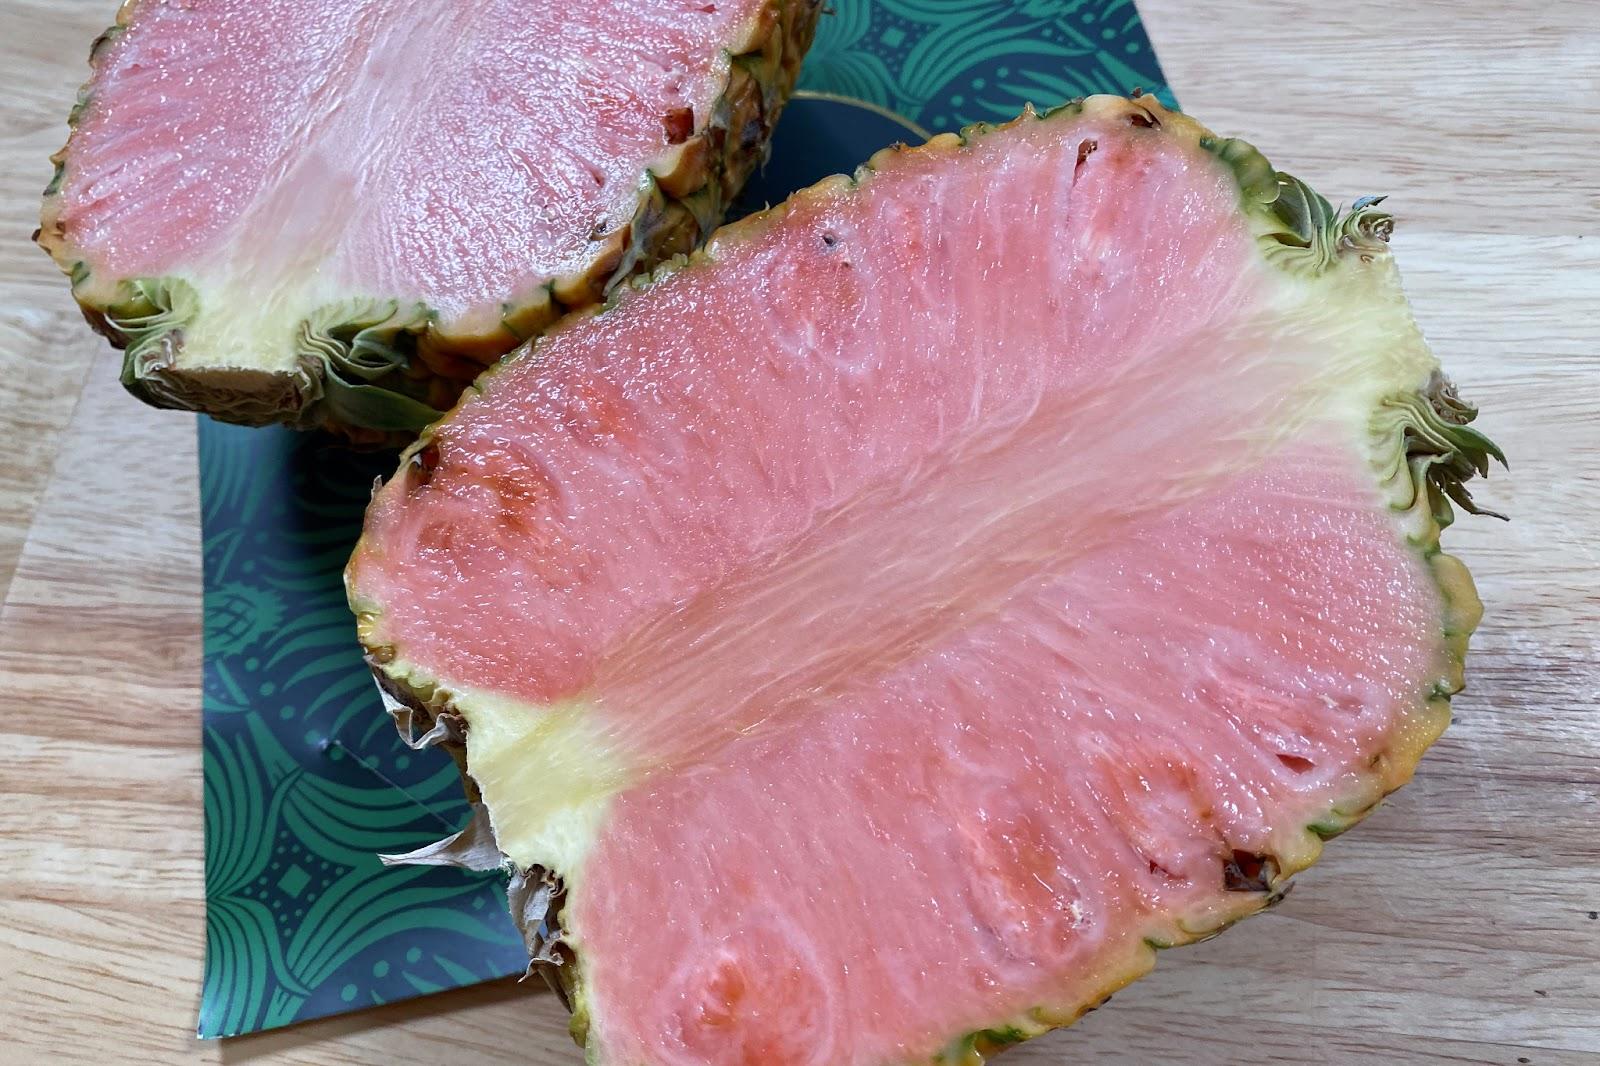 A Pinkglow pineapple cut in half.